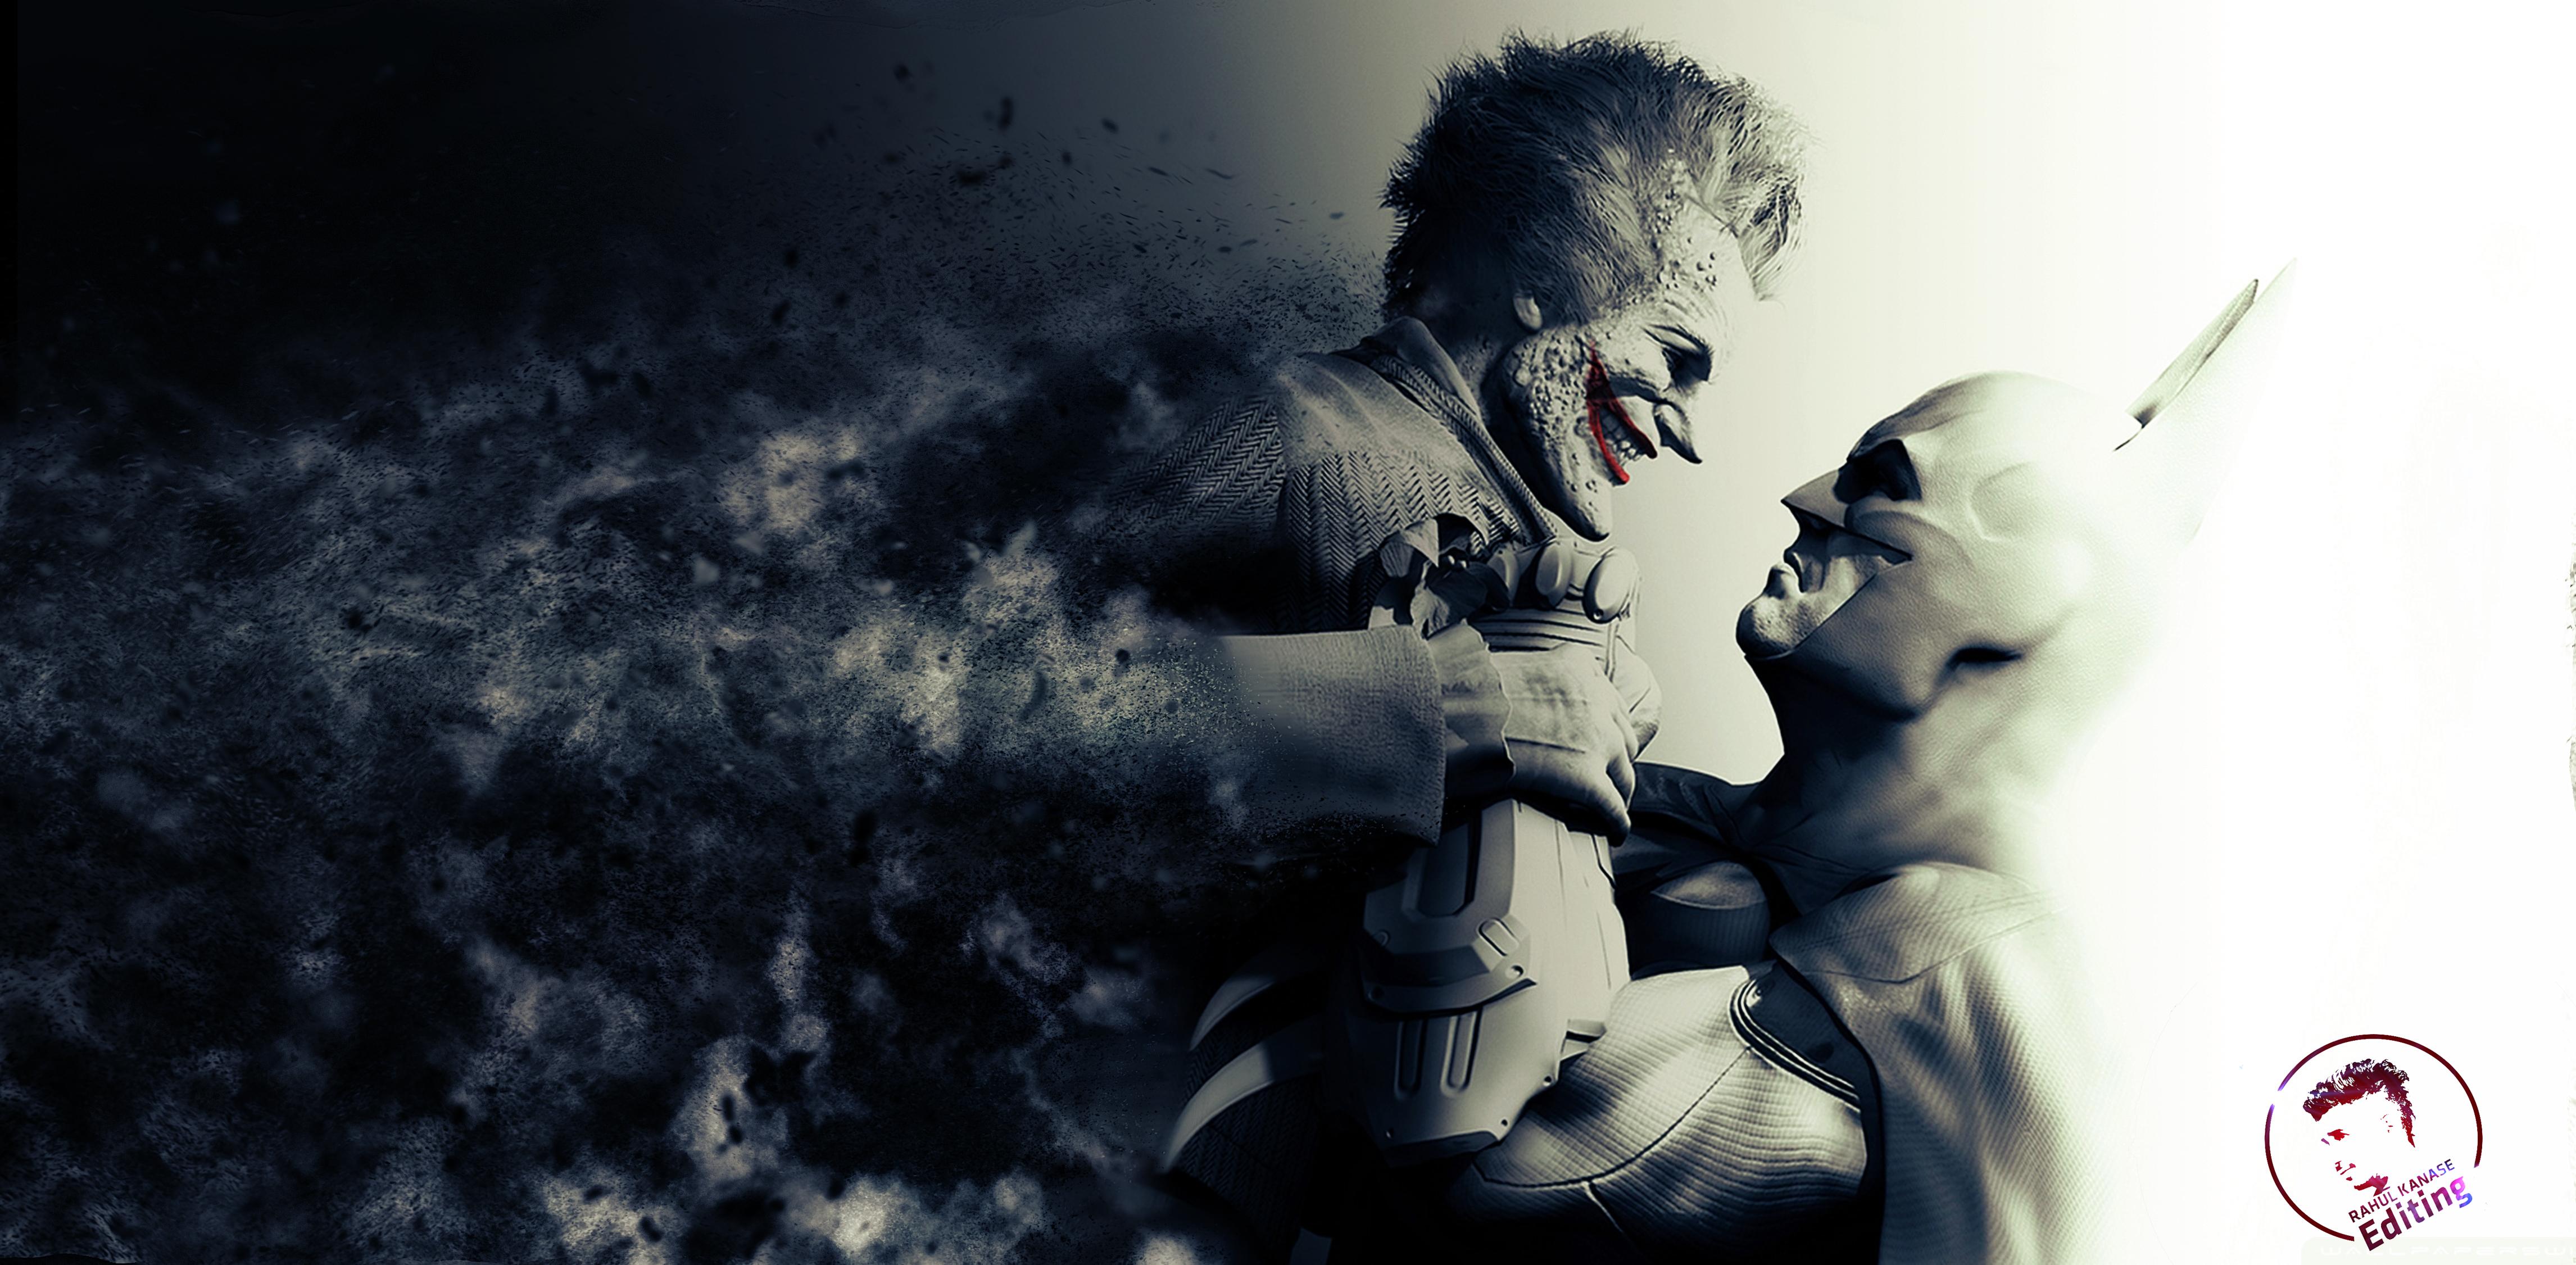 Batman arkham city 4k ultra hd wallpaper and background for Joker wallpaper 4k